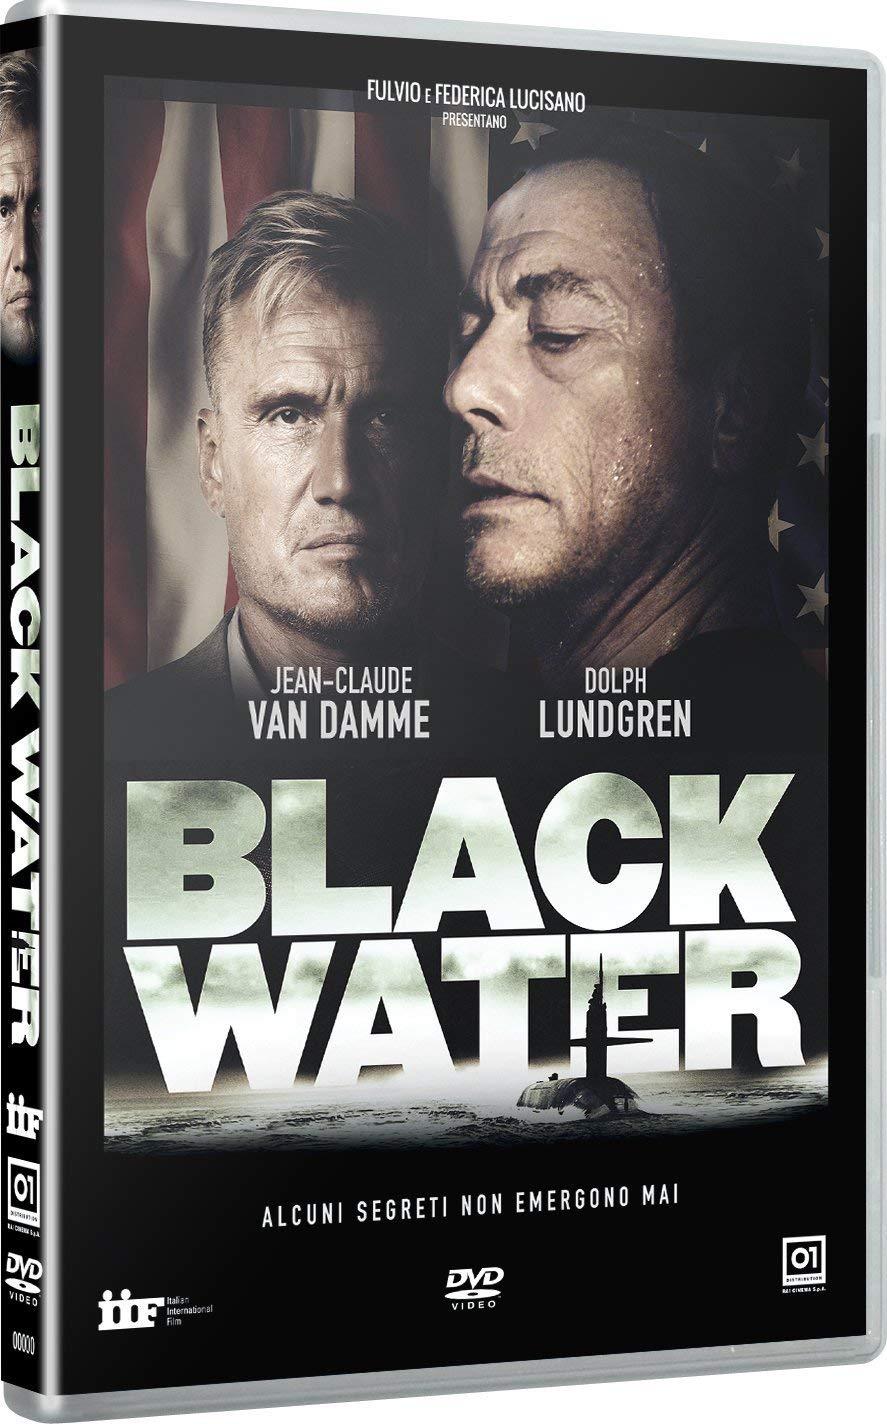 BLACK WATER (DVD)